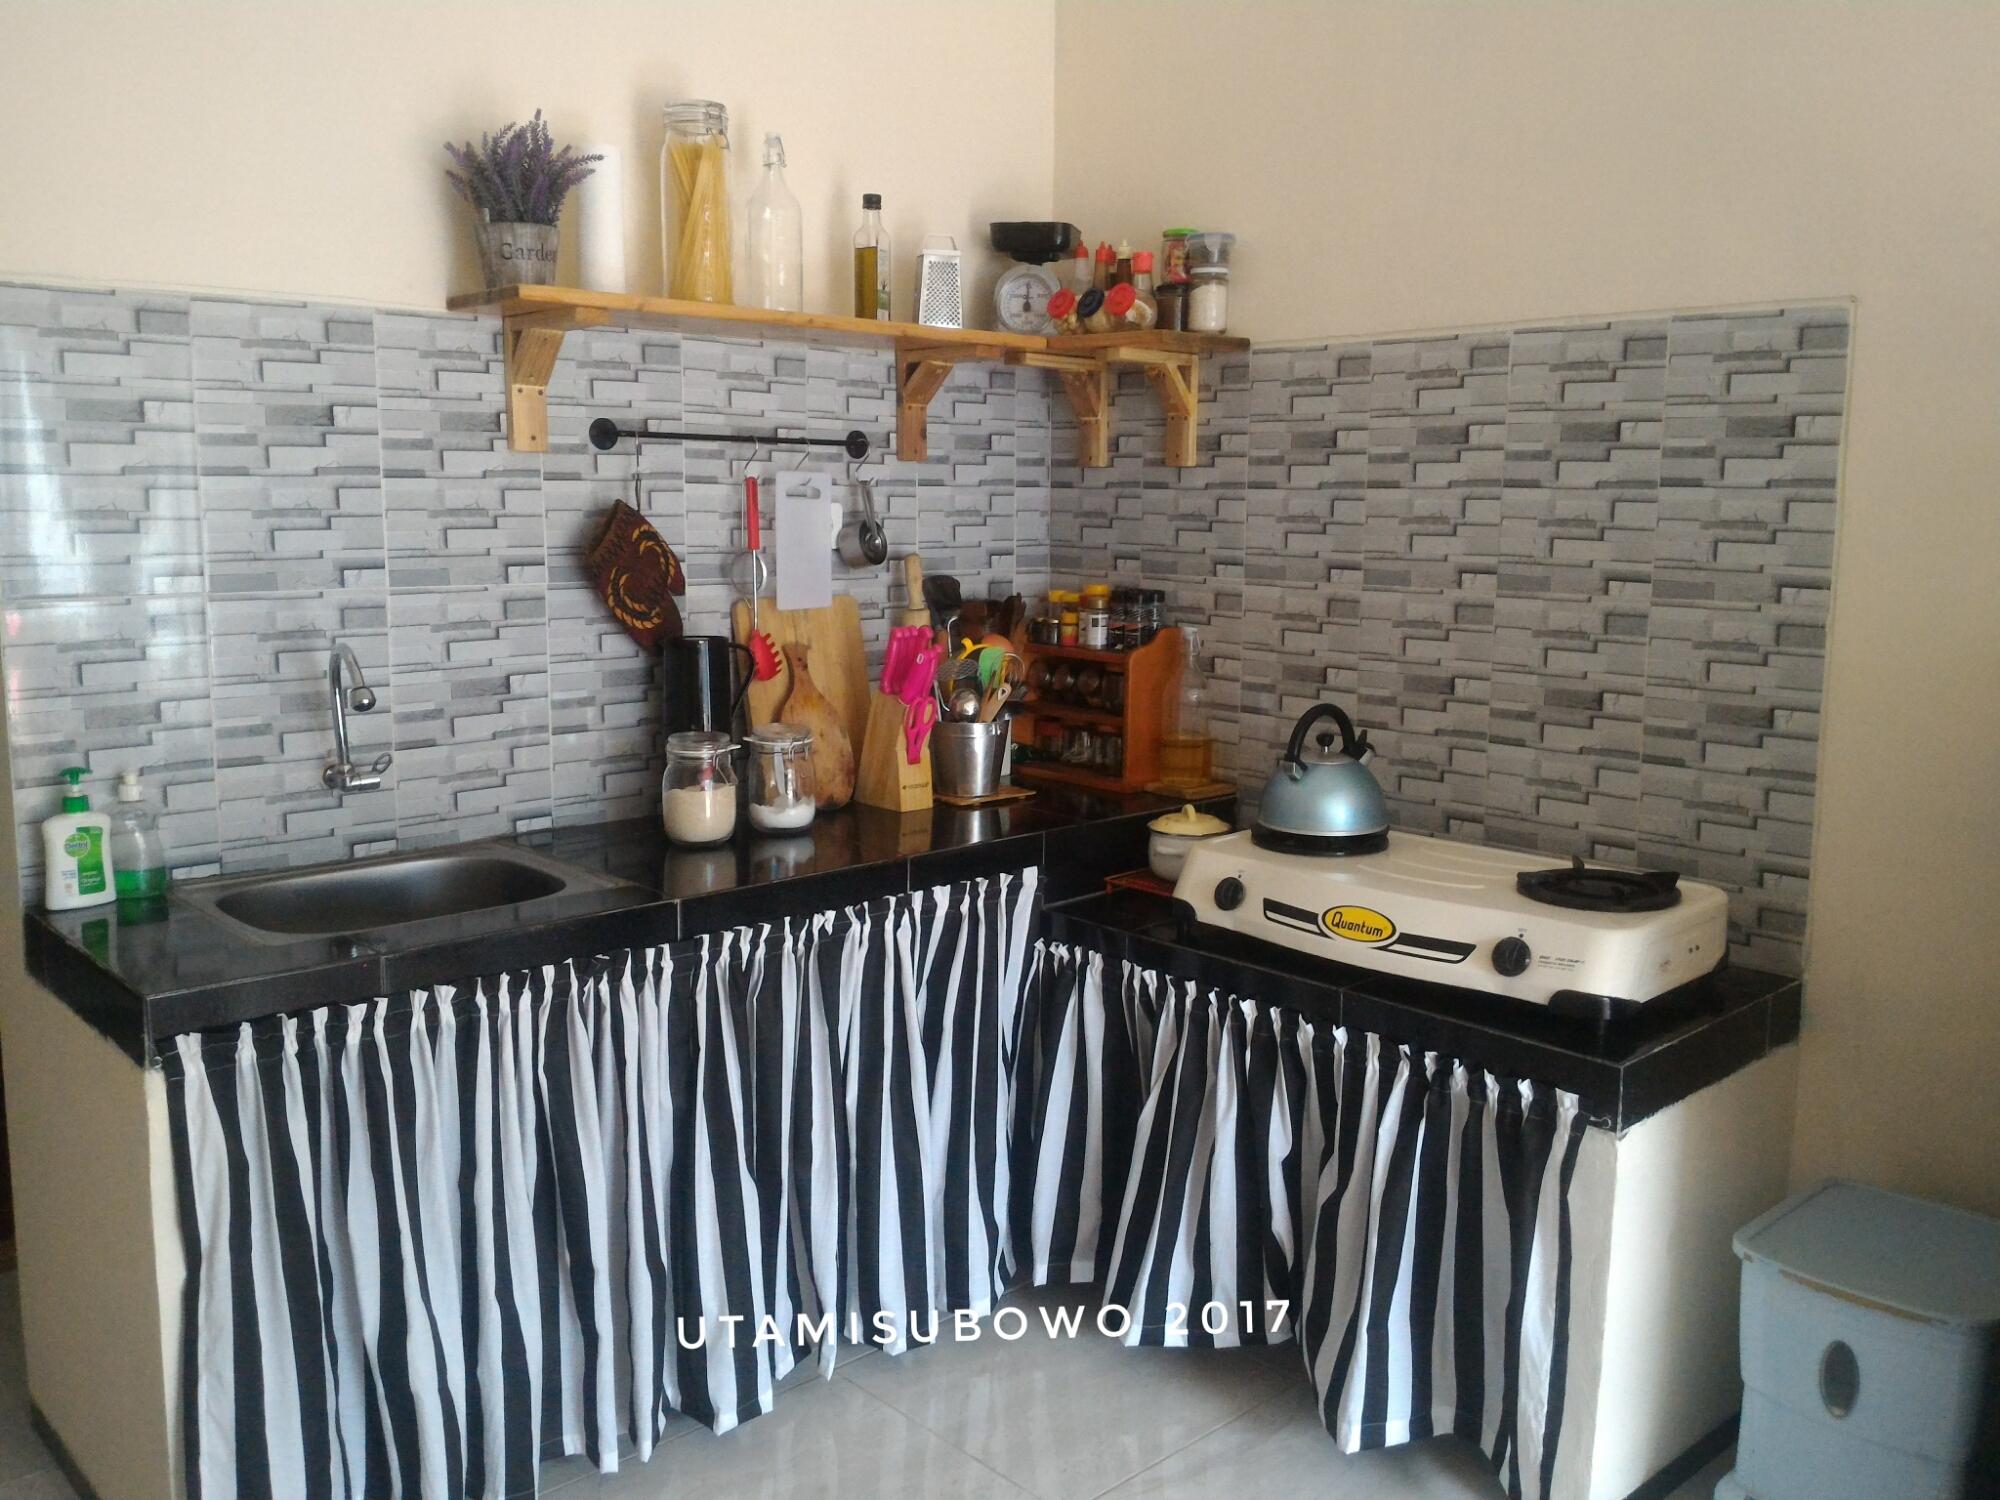 Ide dapur kecil minimalis / kitchen design /small kitchen ...